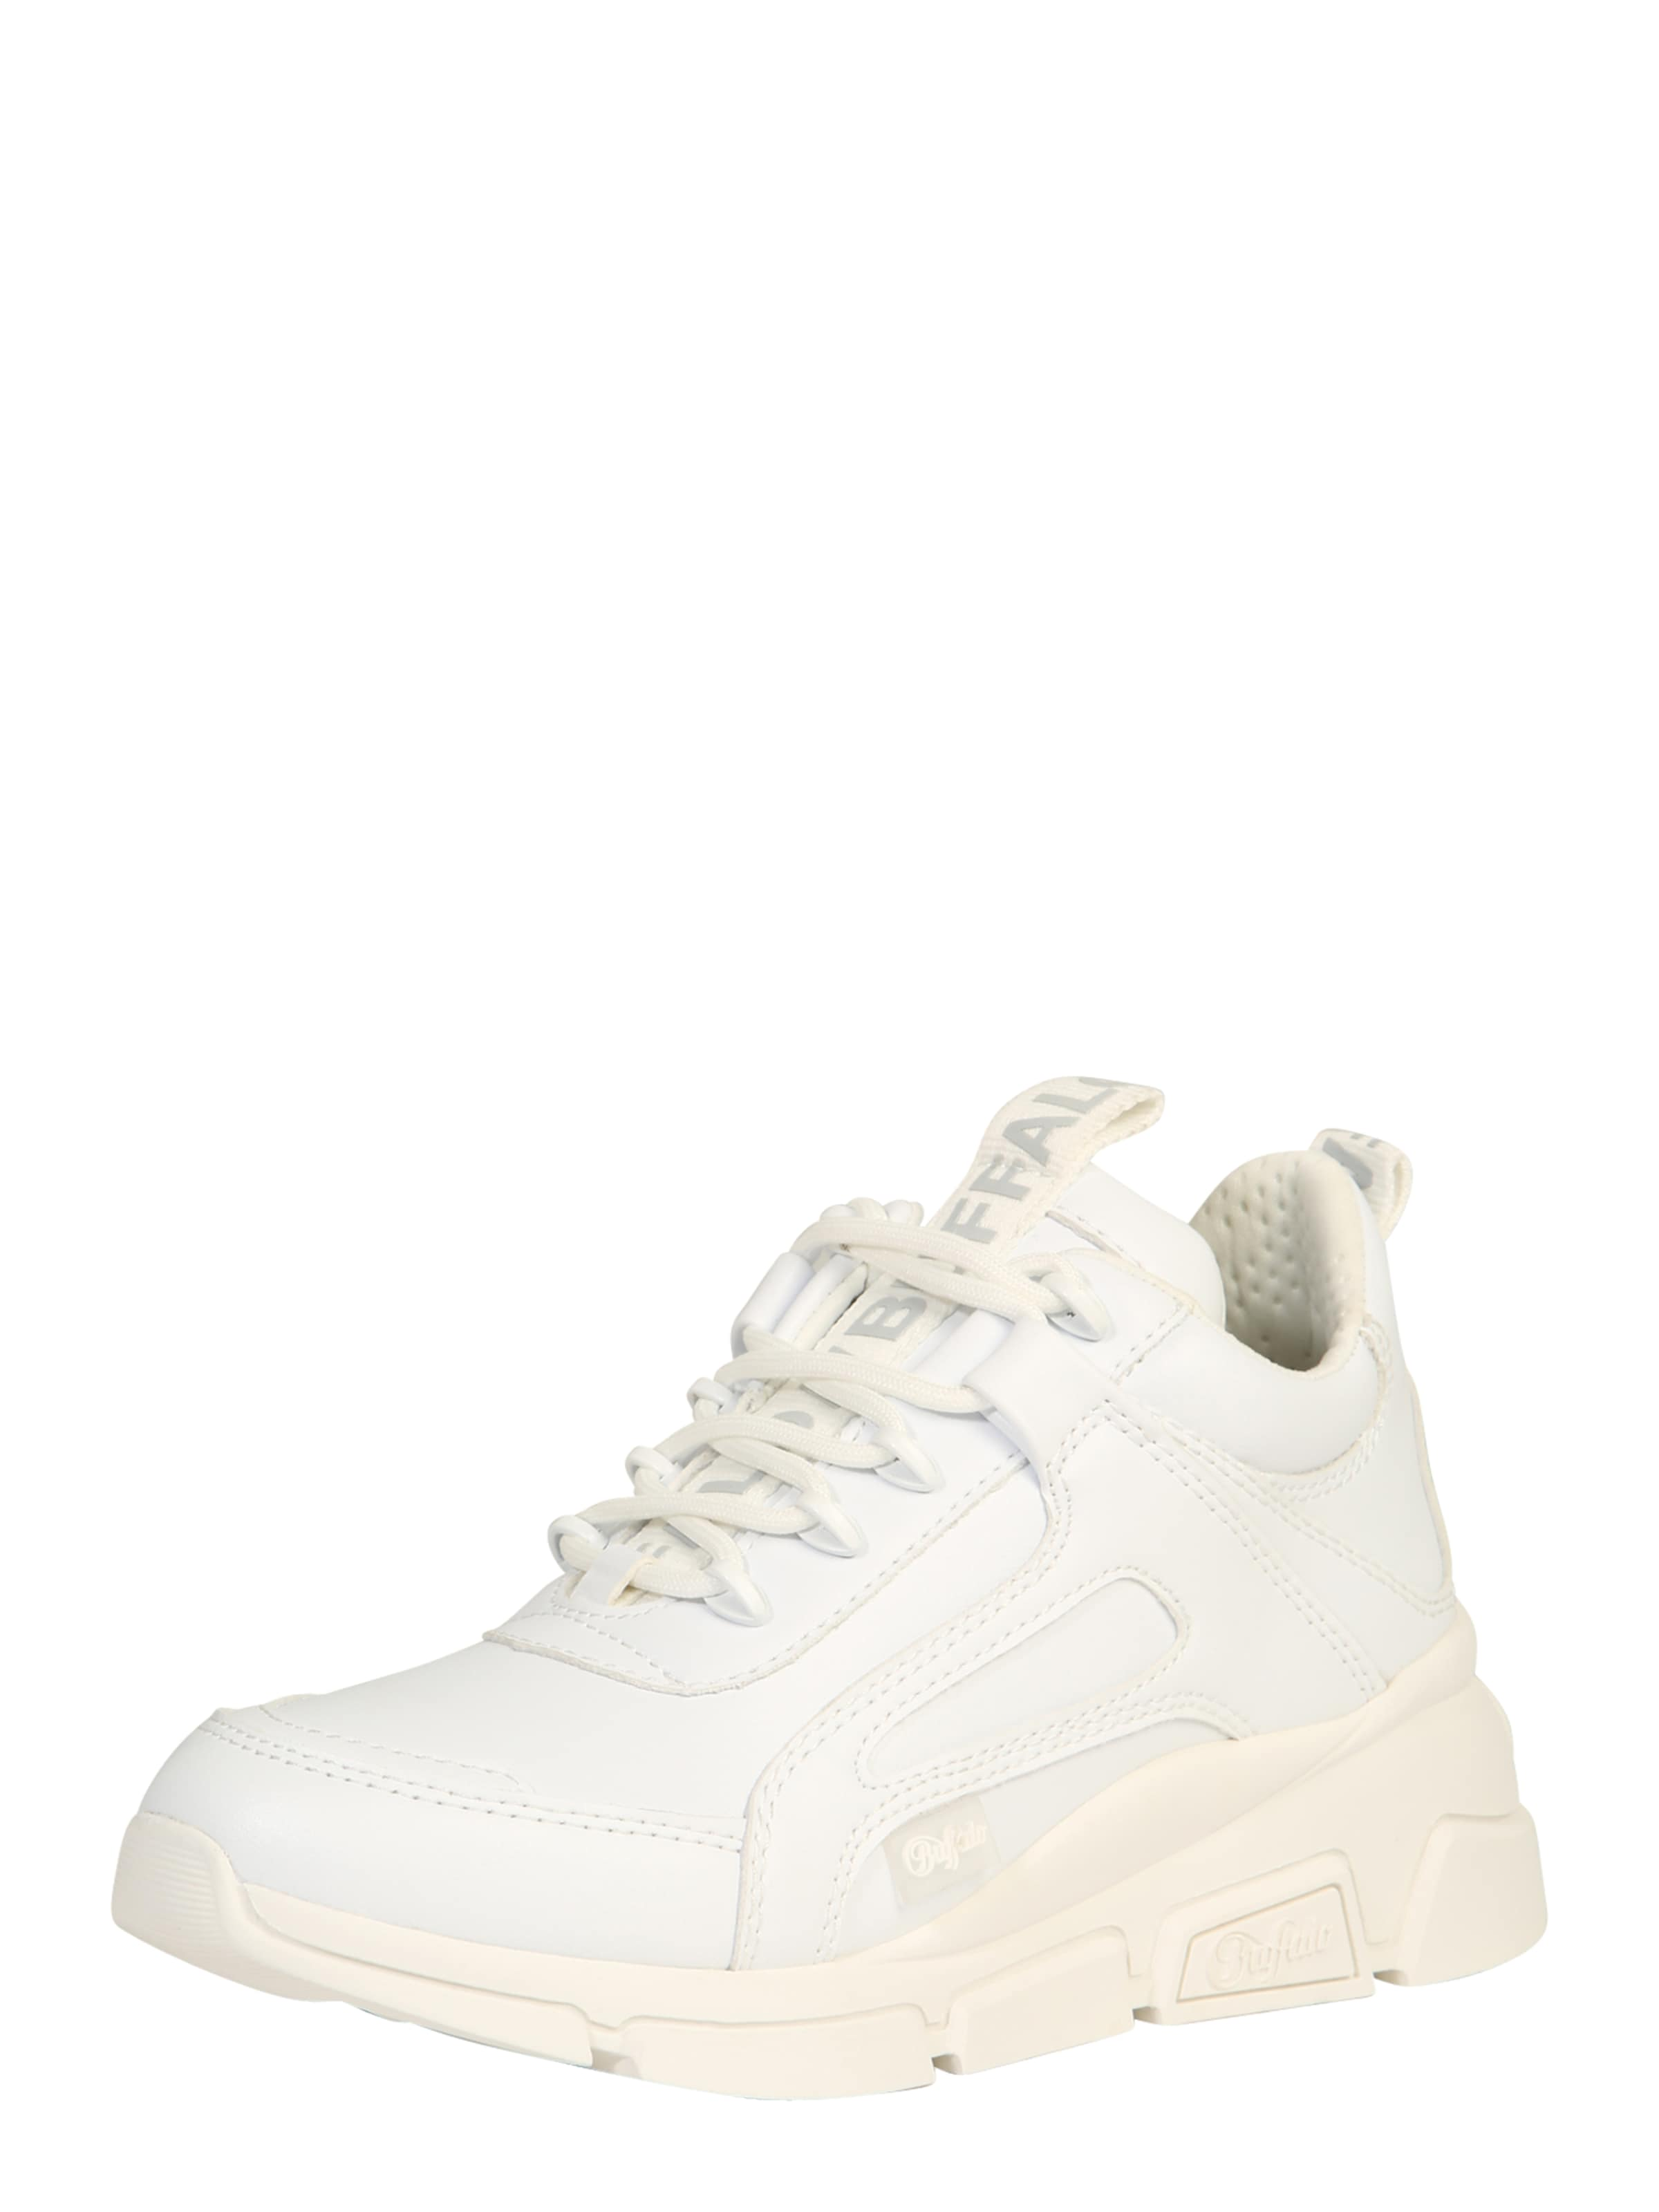 BUFFALO Låg sneaker 'BATTER' i vit